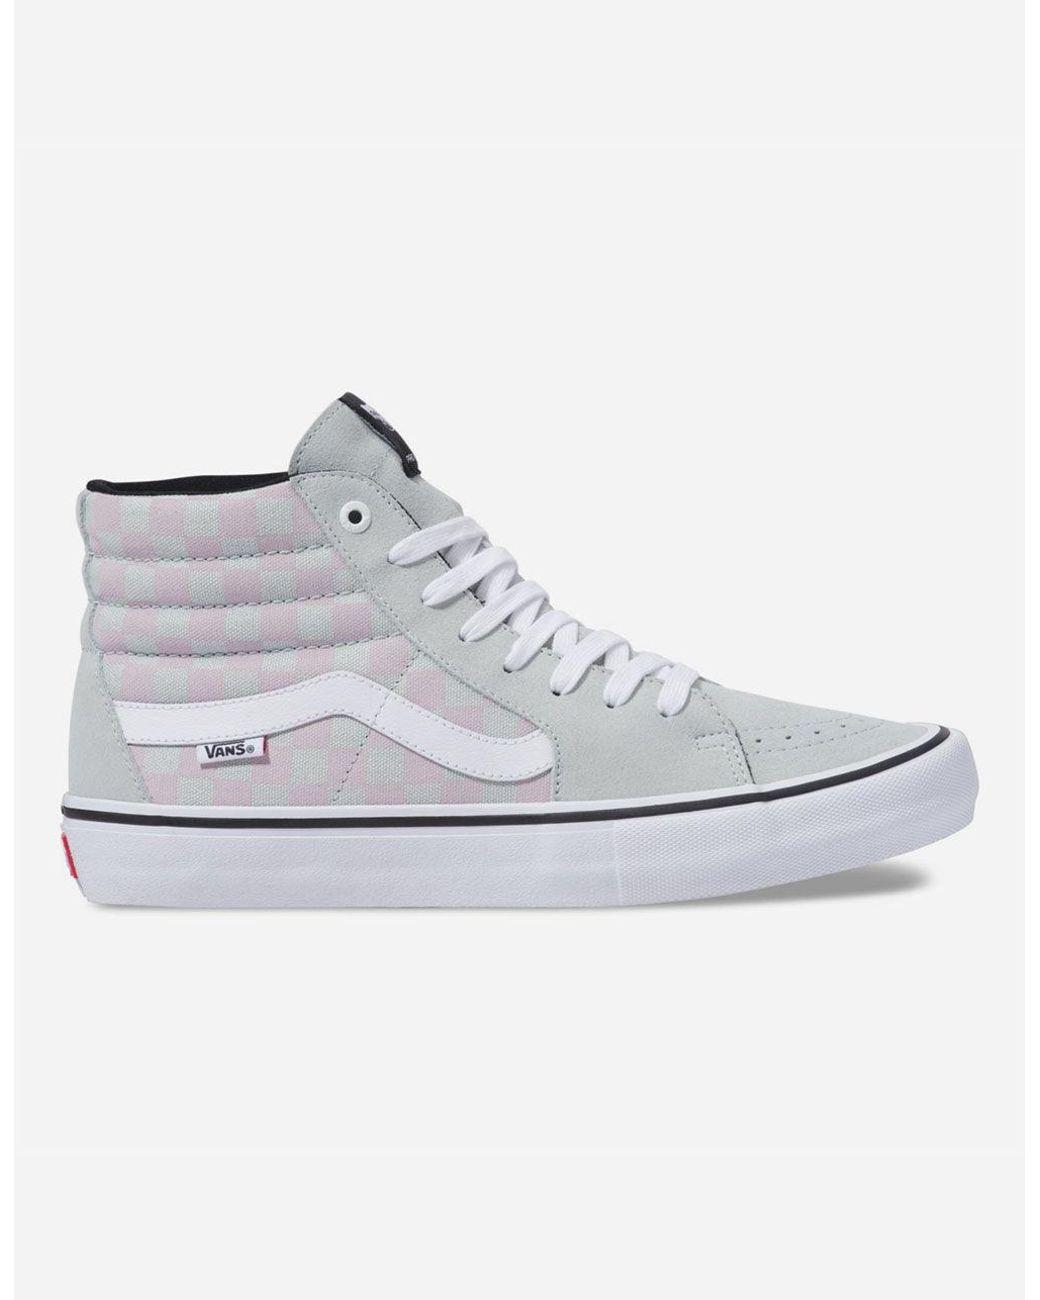 85b473cd2e32 Lyst - Vans Checkerboard Sk8-hi Pro Smoke   Violet Ice Shoes for Men